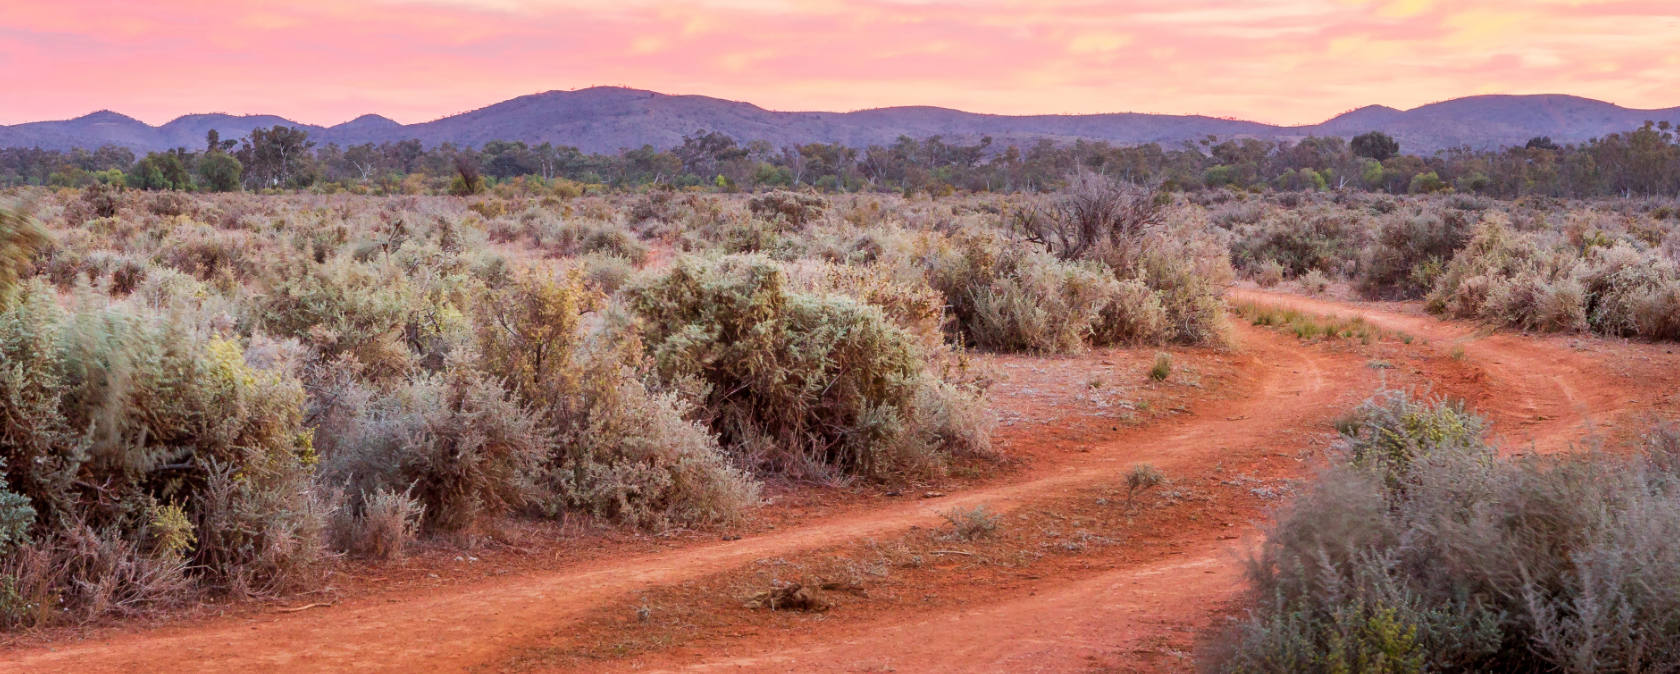 A red dirt road through Australian scrublands at sunset